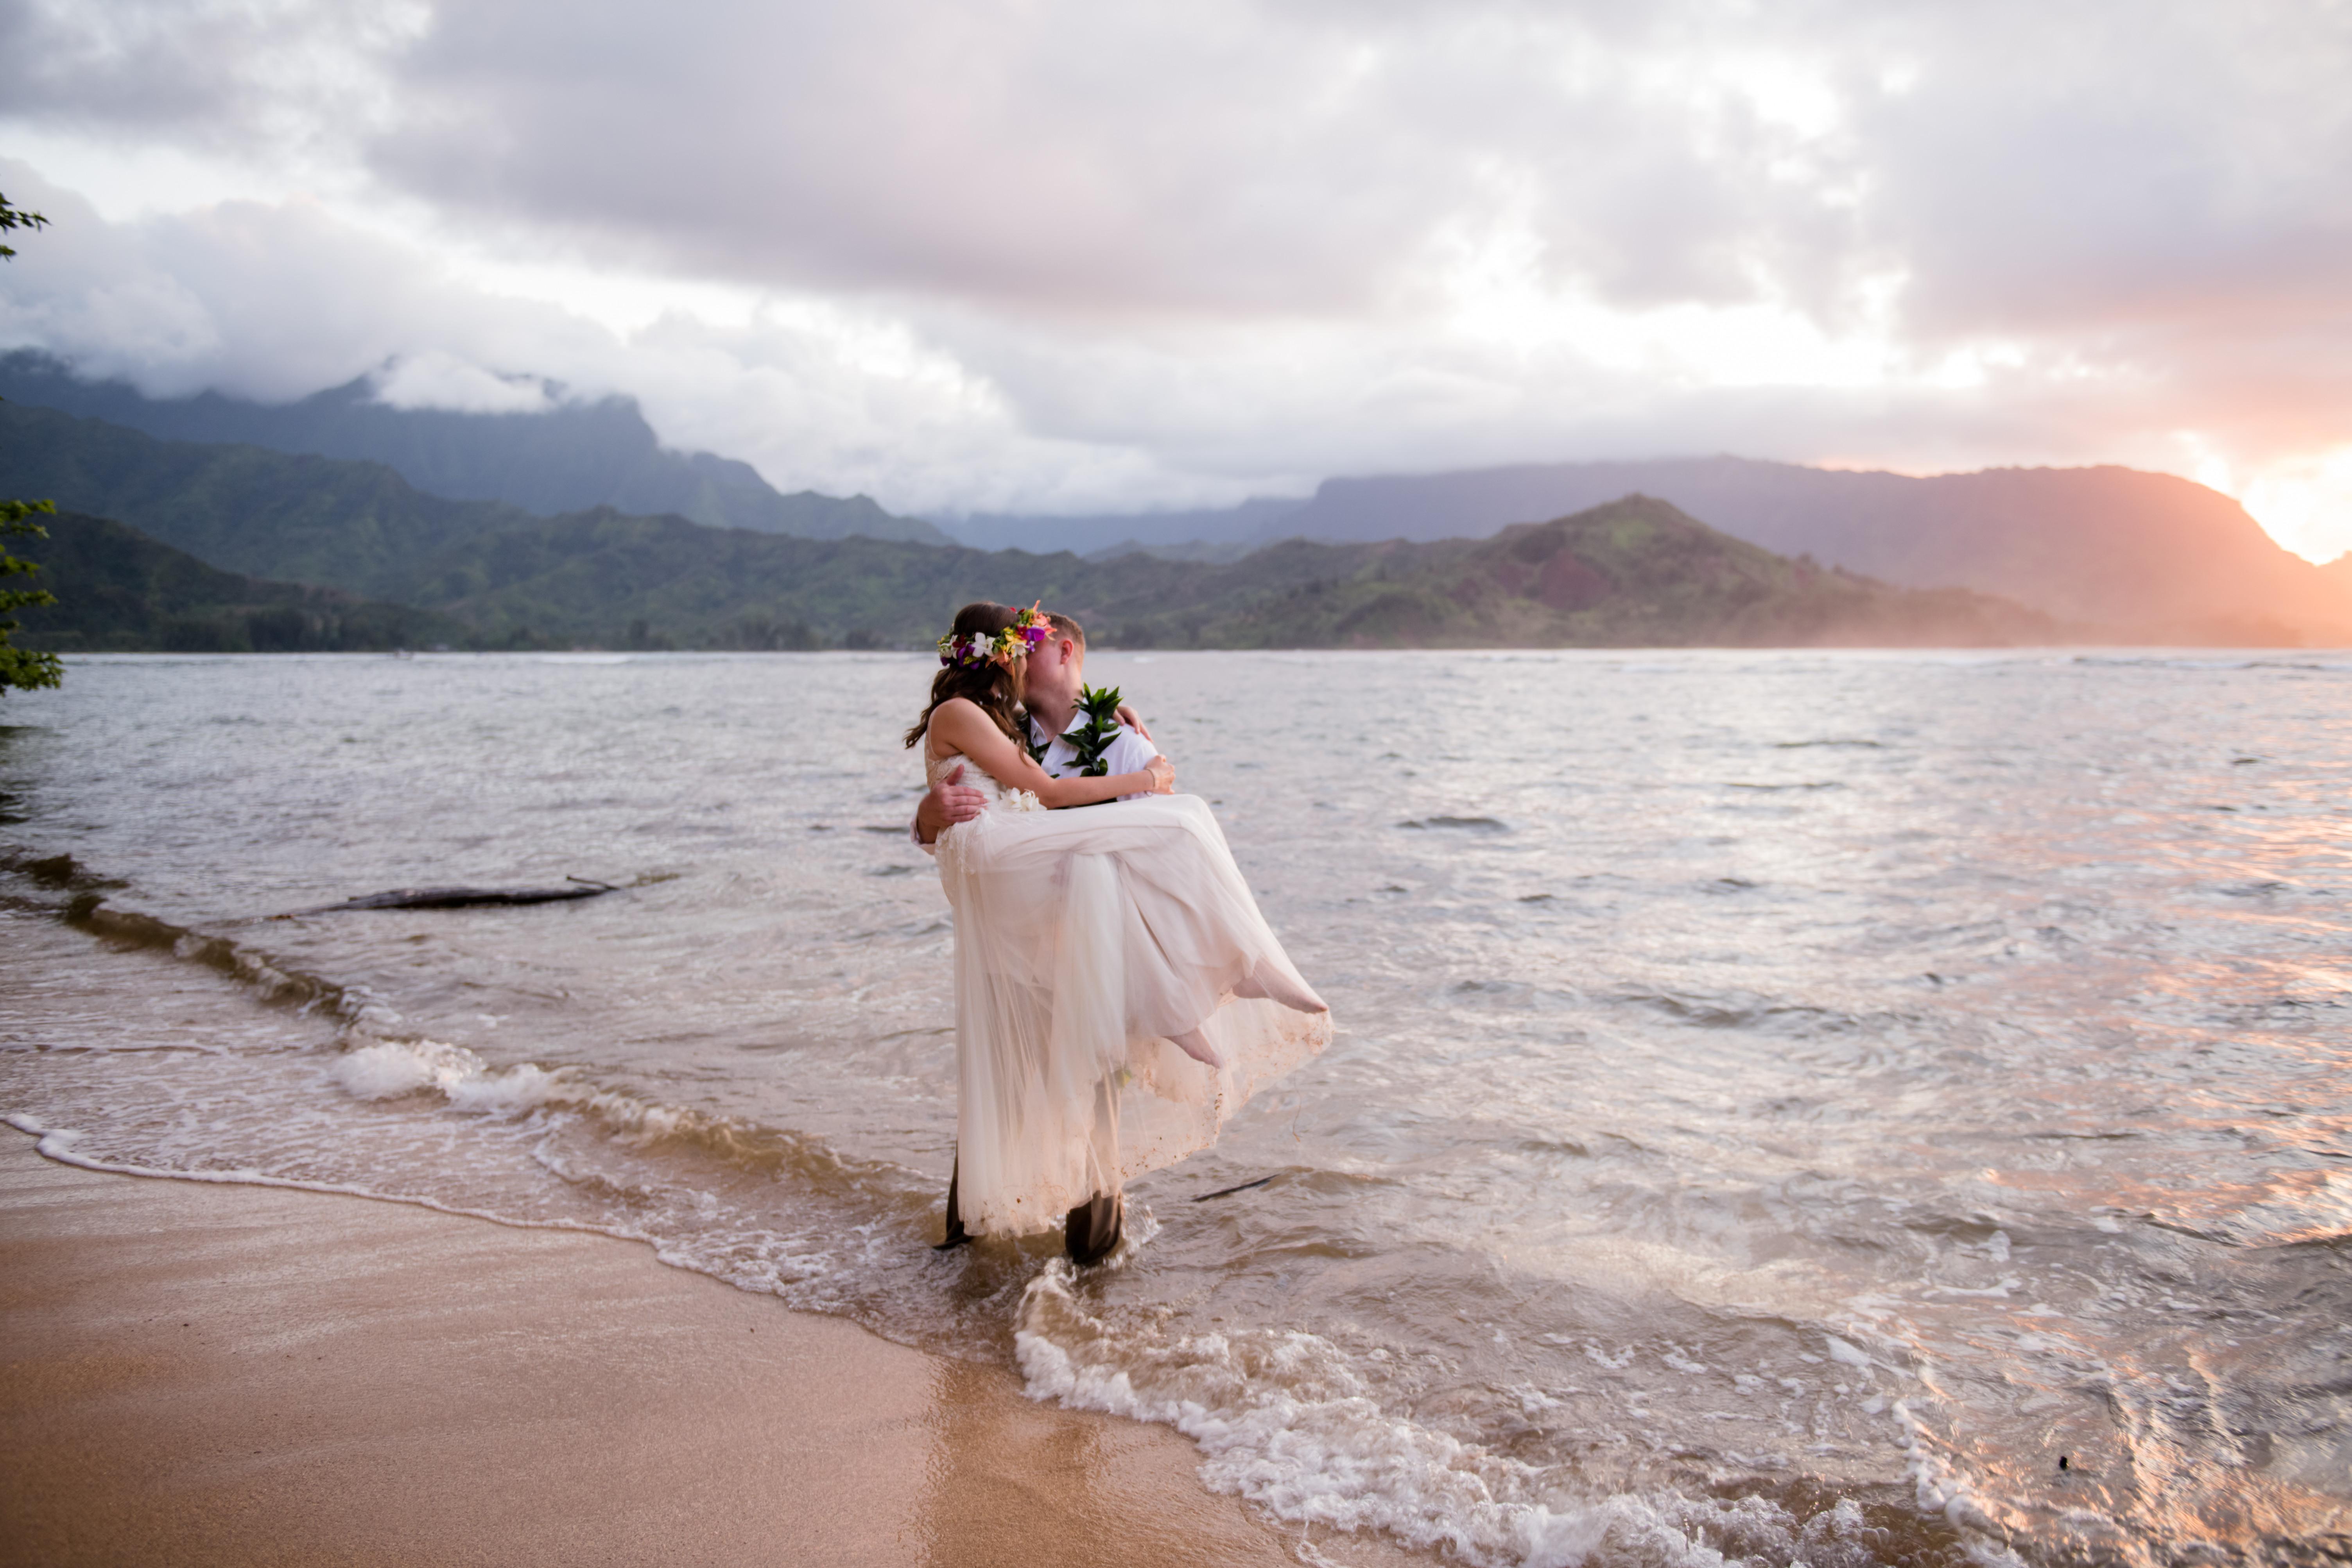 1/2 day of Kauai Wedding Photography